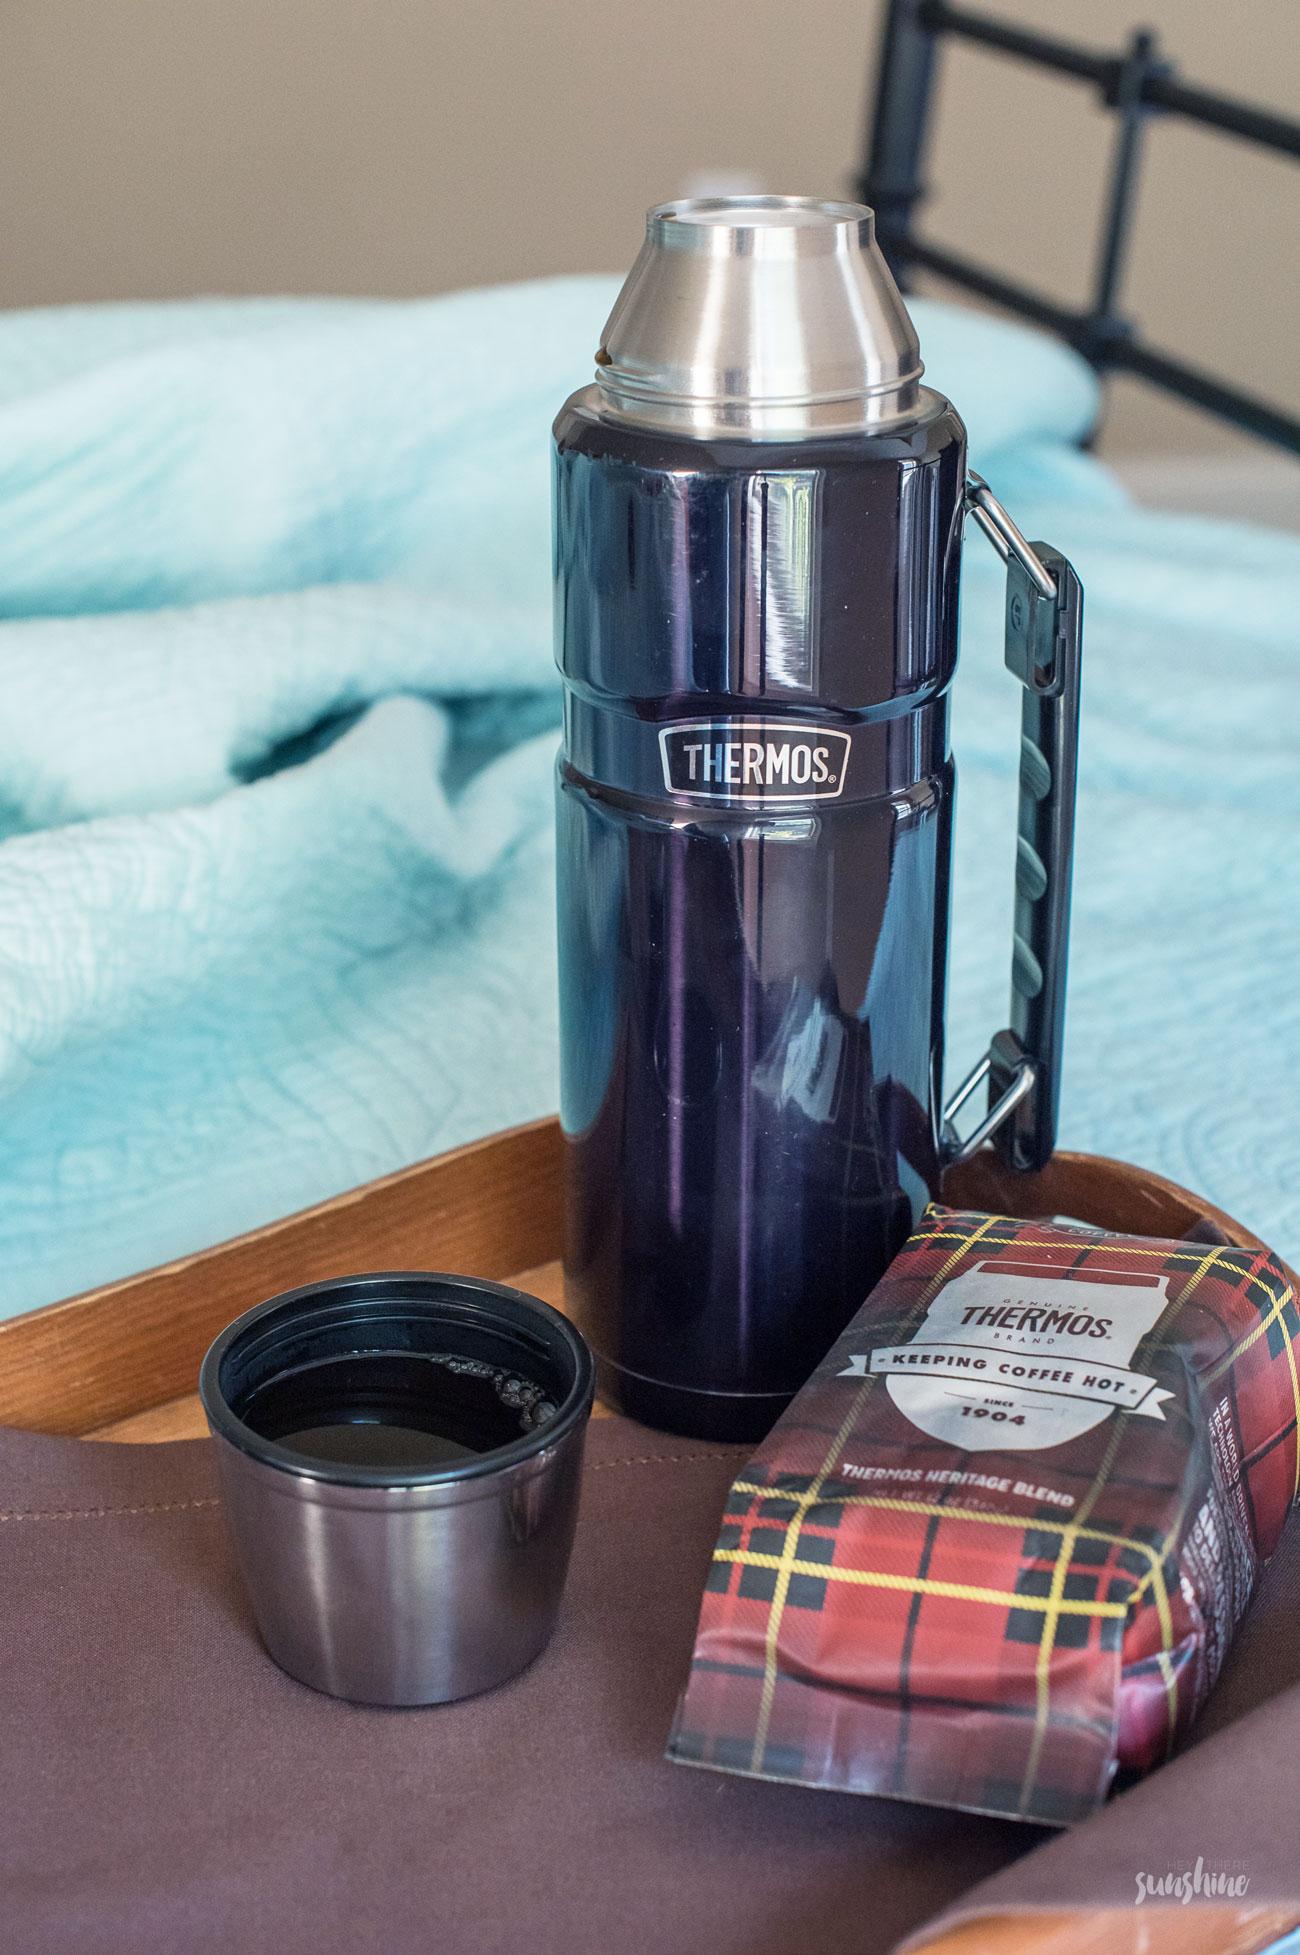 thermos-overnight-coffee